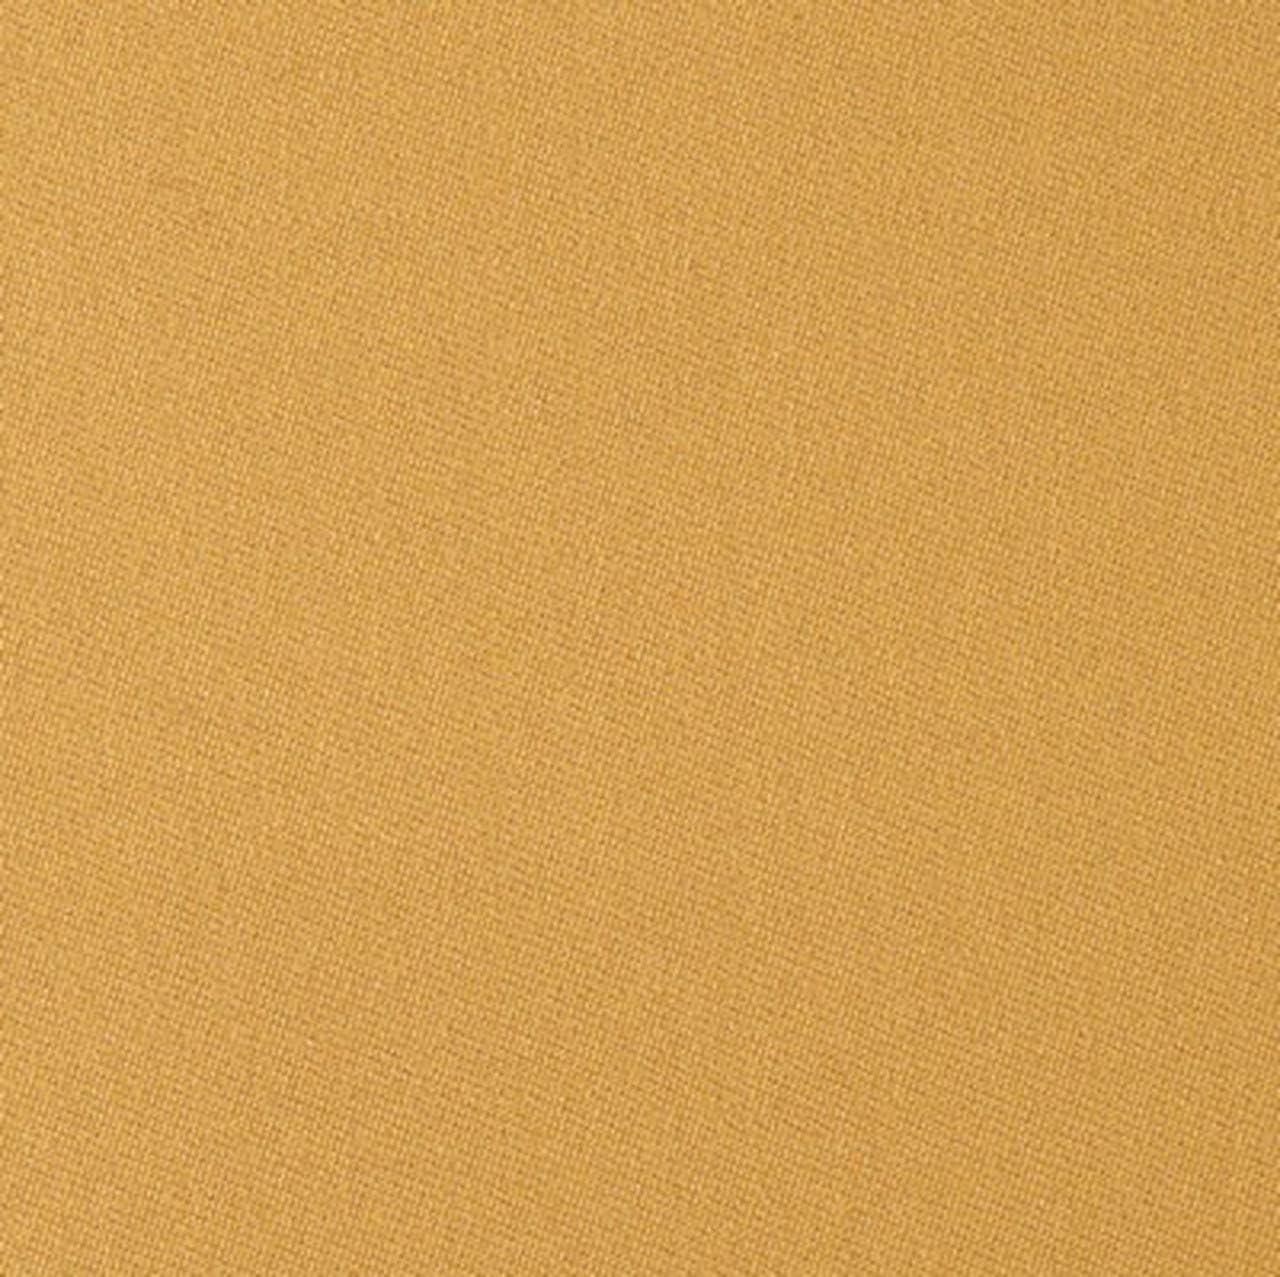 Simonis 12' Ranking TOP11 860 San Antonio Mall Gold Billiard Cloth Pool Table Felt